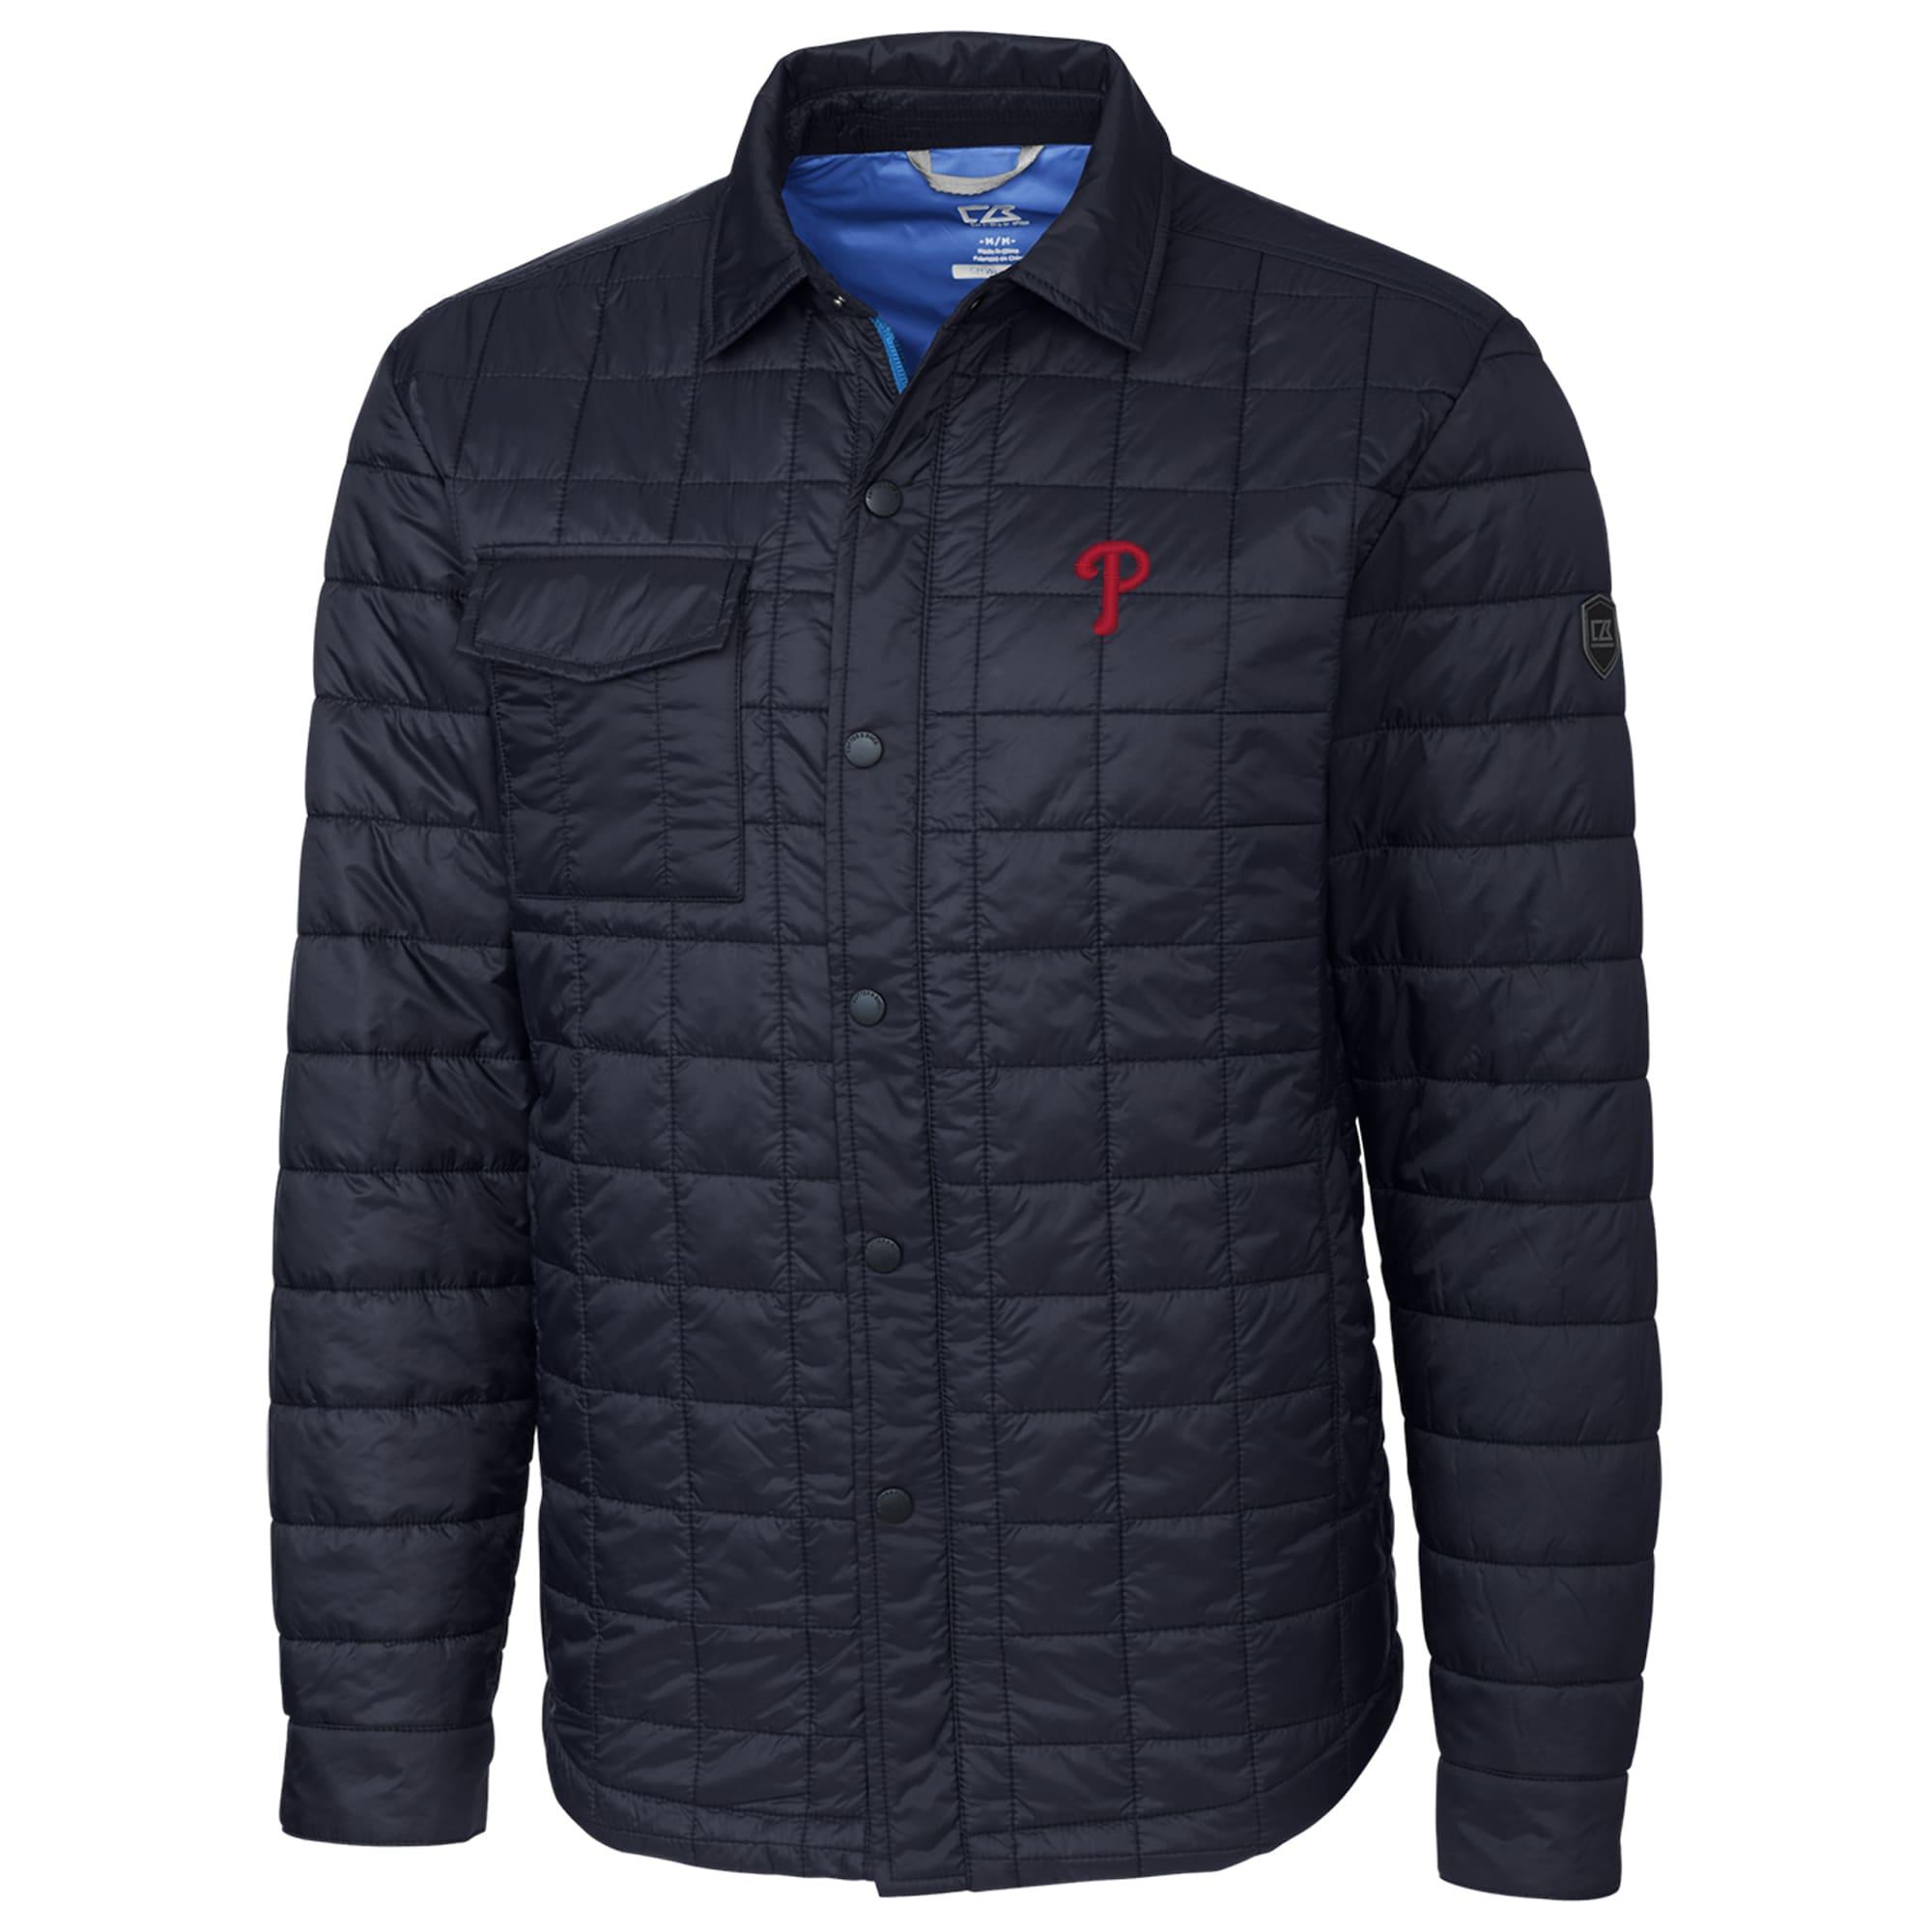 Philadelphia Phillies Cutter & Buck Rainier Shirt Full-Zip Jacket - Navy